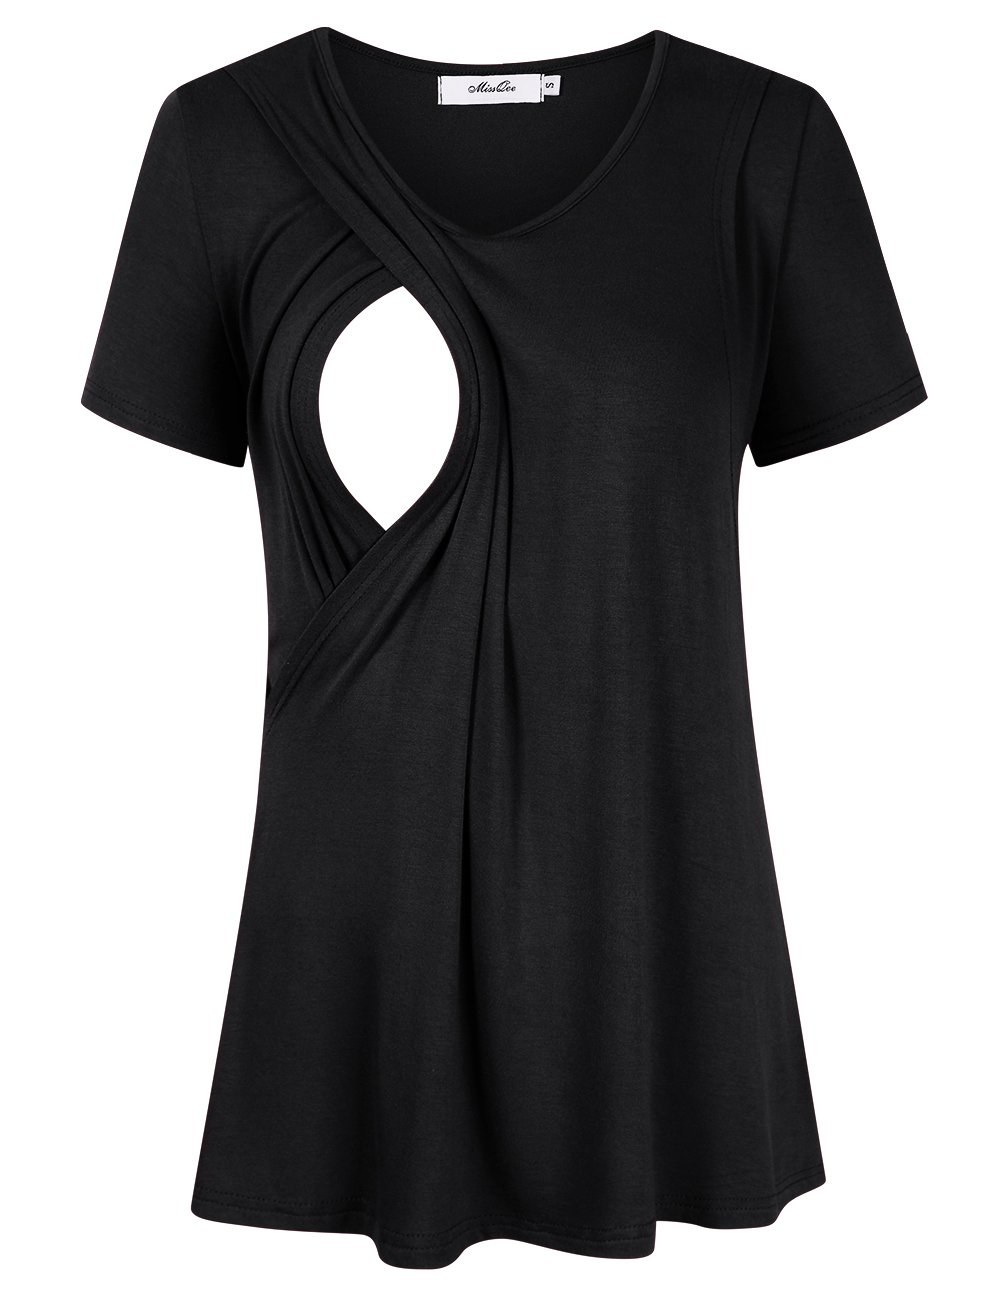 MissQee Maternity Nursing Tops Short Sleeve Breastfeeding T-Shirts L Black